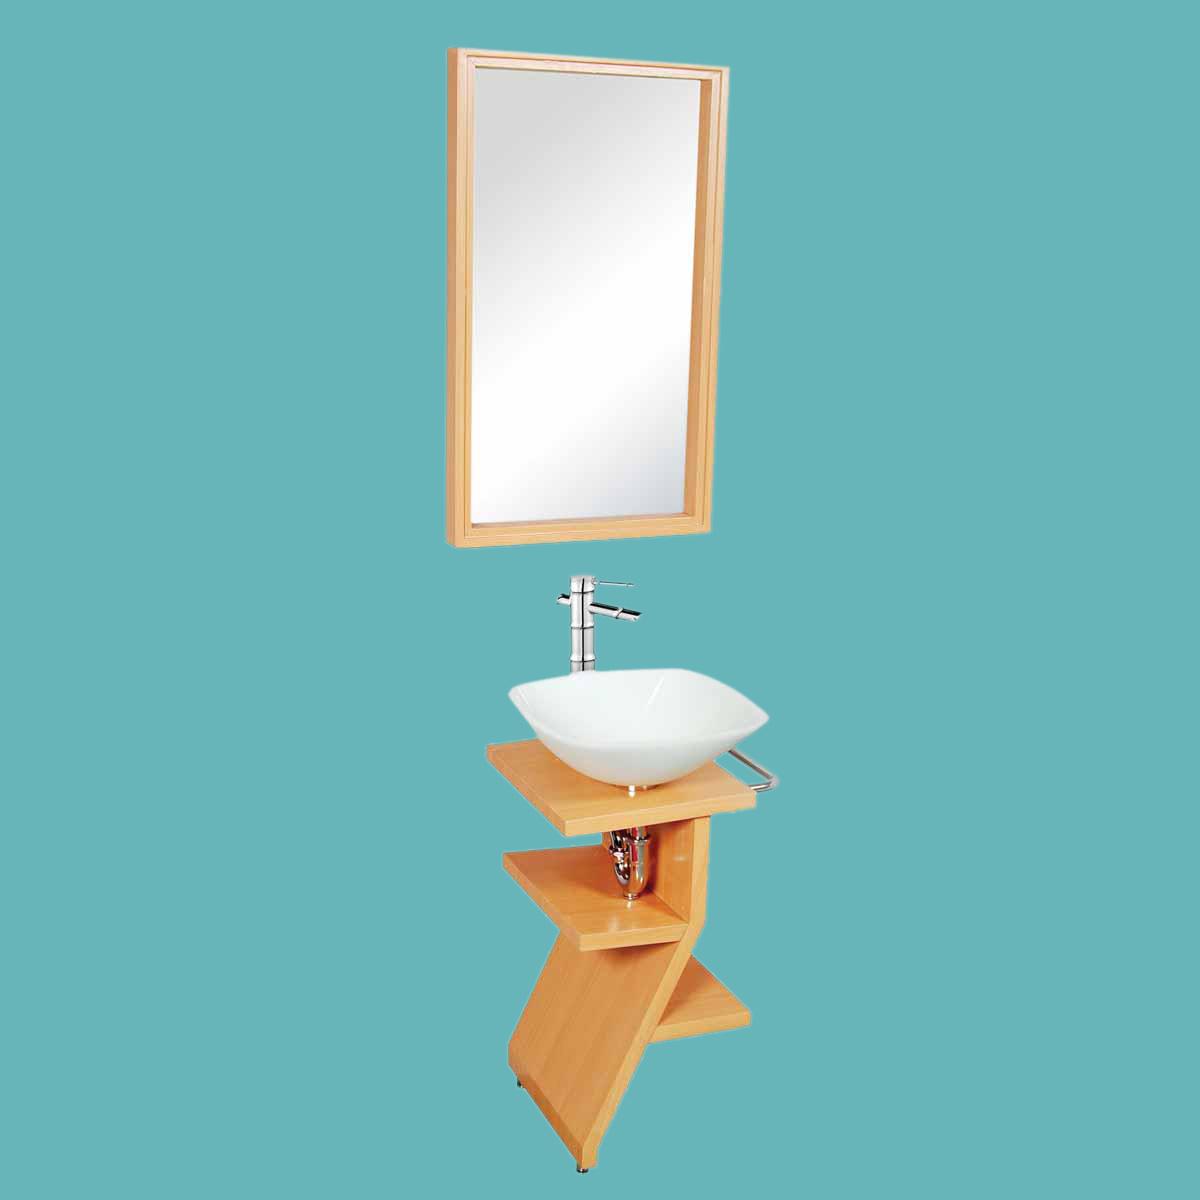 Wood Pedestal Sink : Bathroom Milky Glass Pedestal Sink Wood Stand Towel Bar